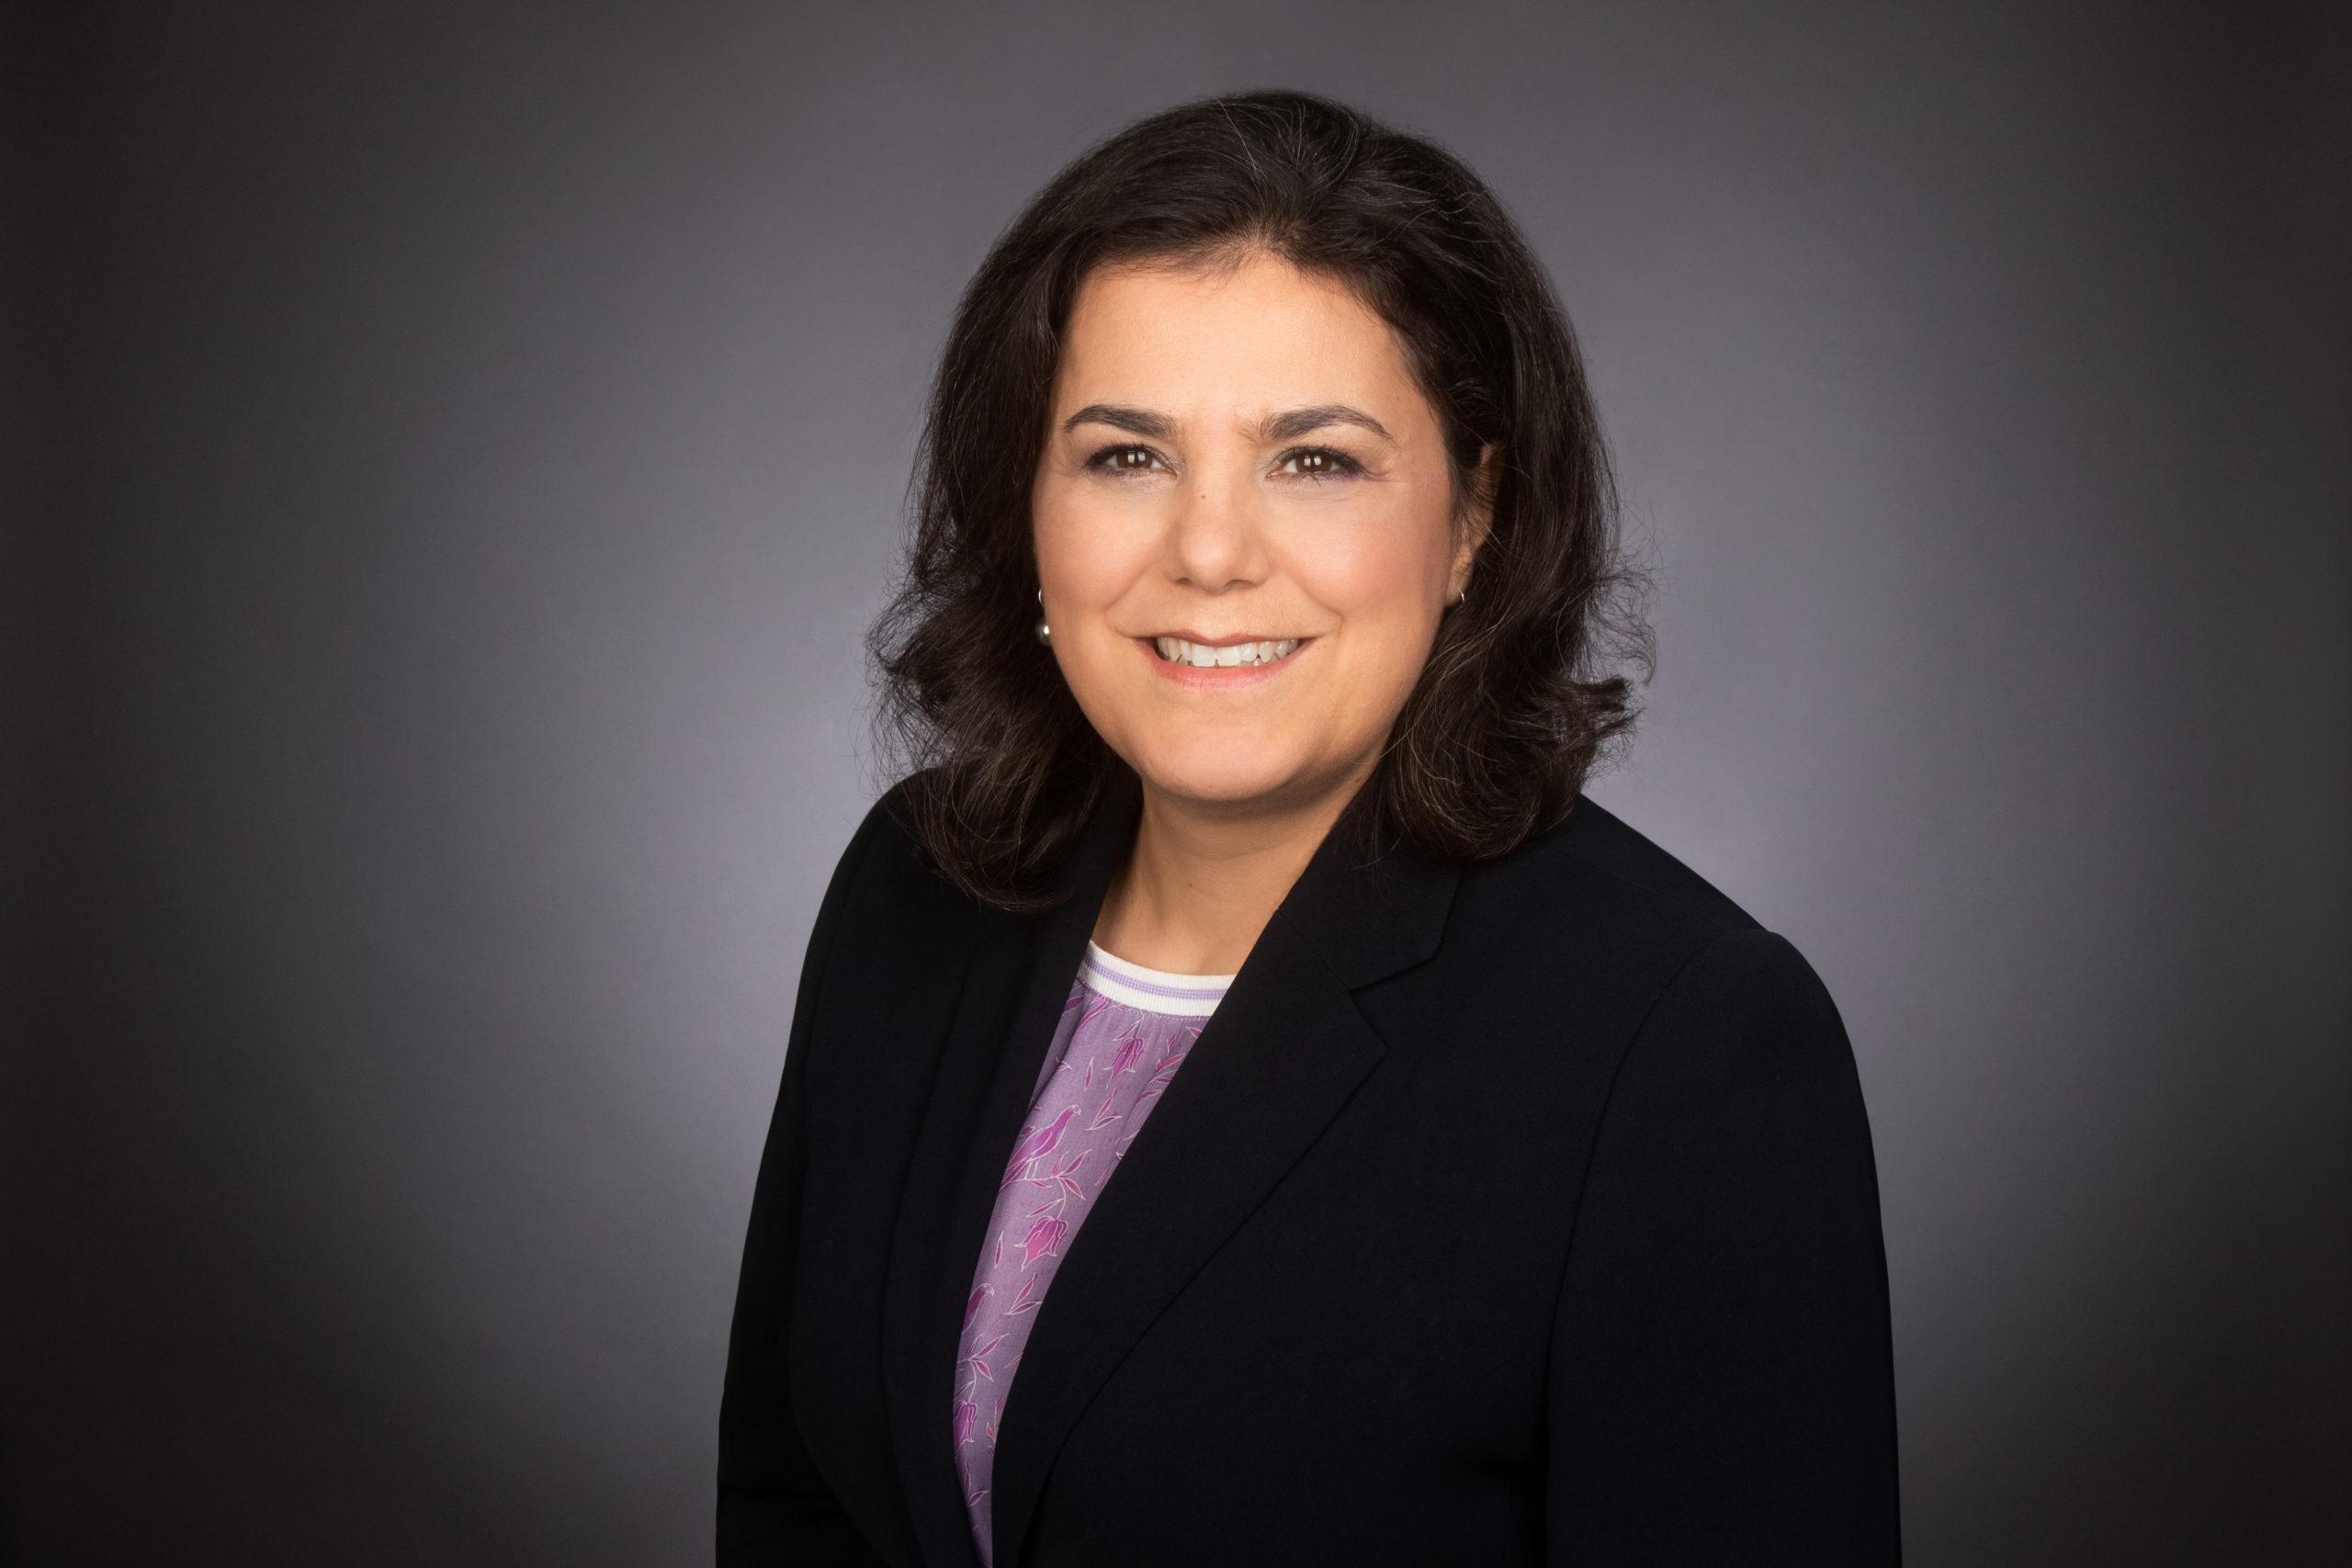 Prof. Dr. Carmela Aprea